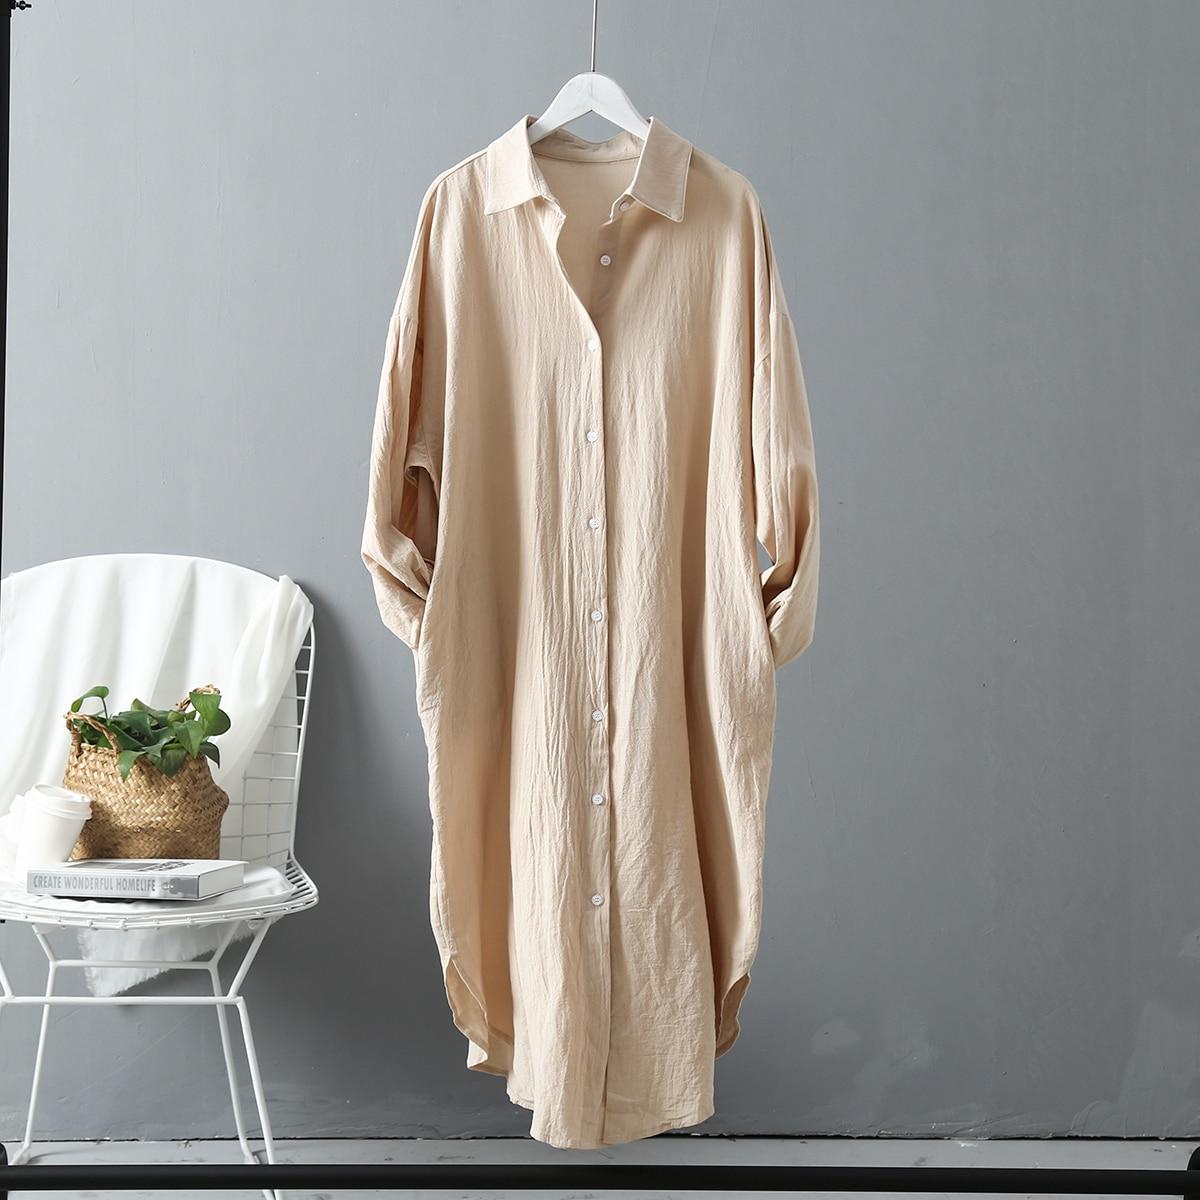 Korean Casual White Blouse Women Side Pocket Design Spring Autumn Ladies Tops Long Sleeve Cotton Linen Plus Size Long Shirts